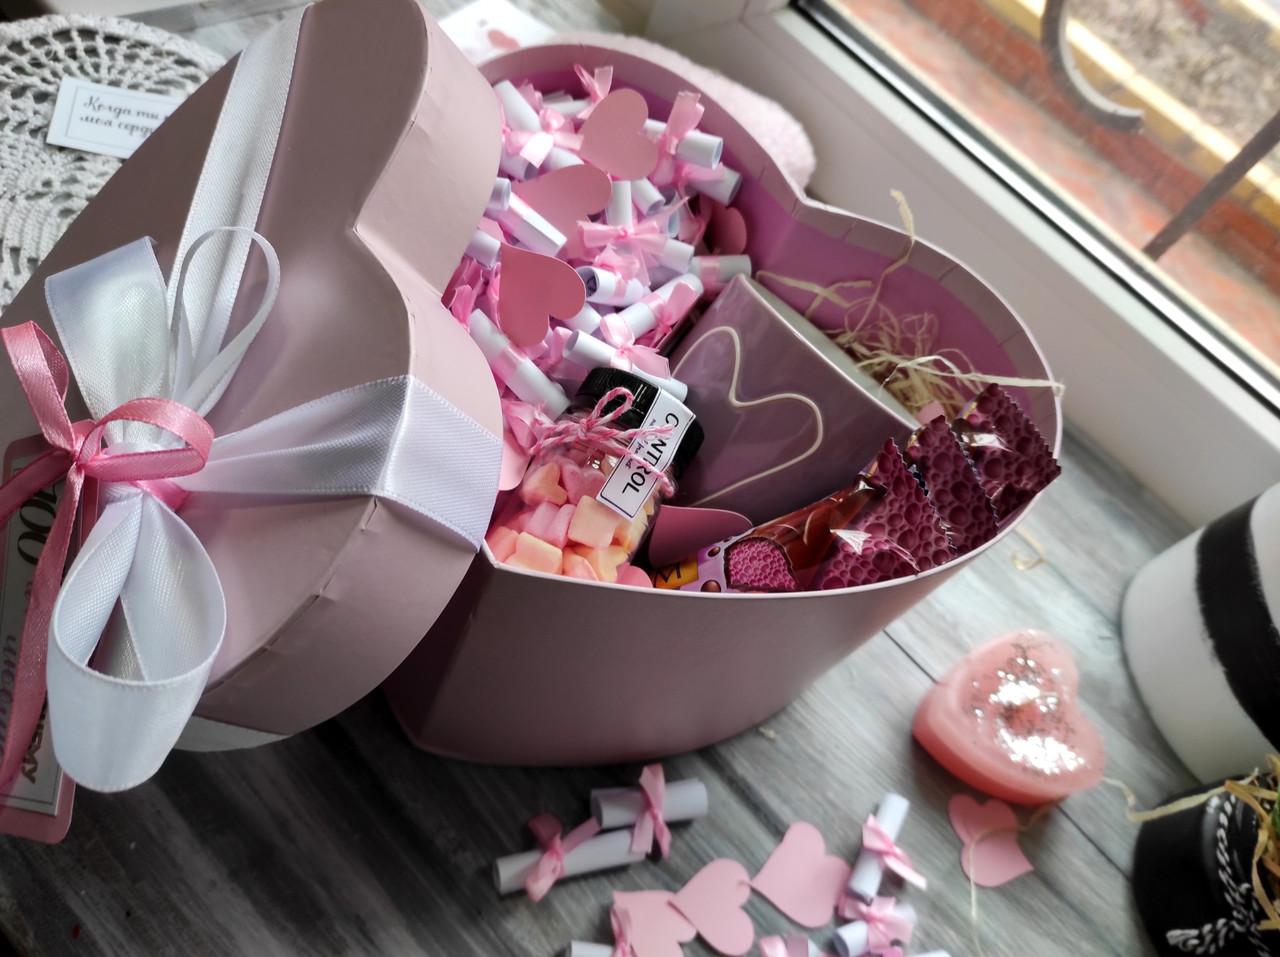 Коробка 100 причин кохання з сувенирами и солодощами